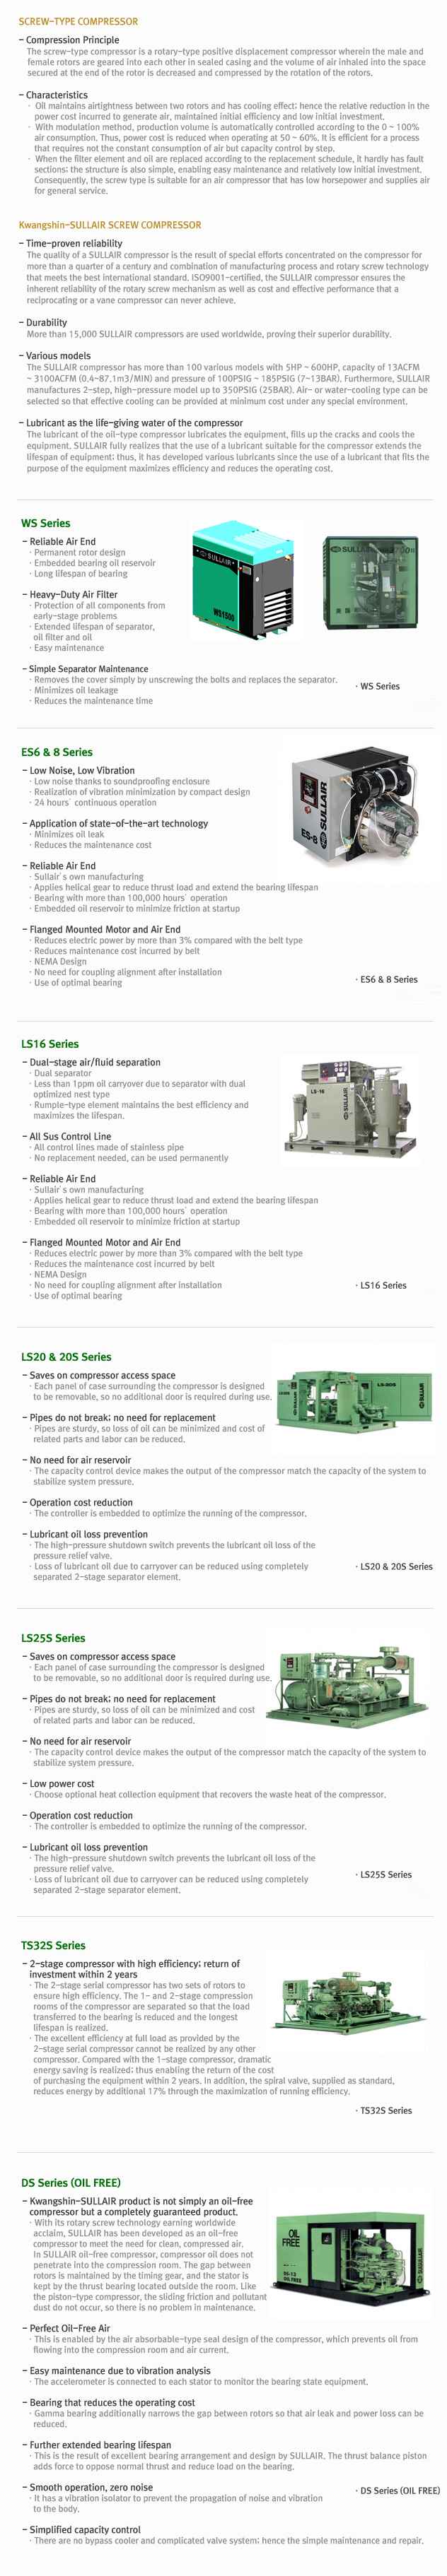 KWANGSHIN Screw-Type Compressors